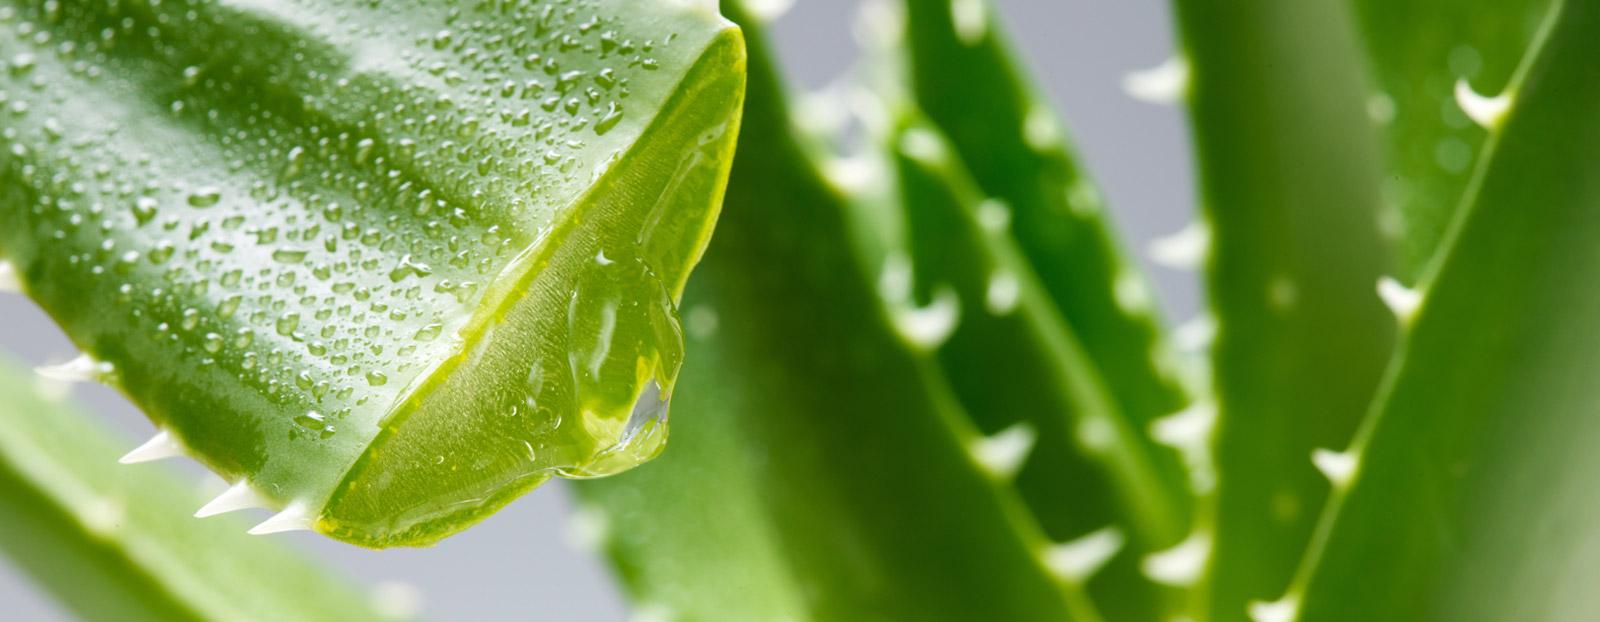 Aloe vera in its natural habitat